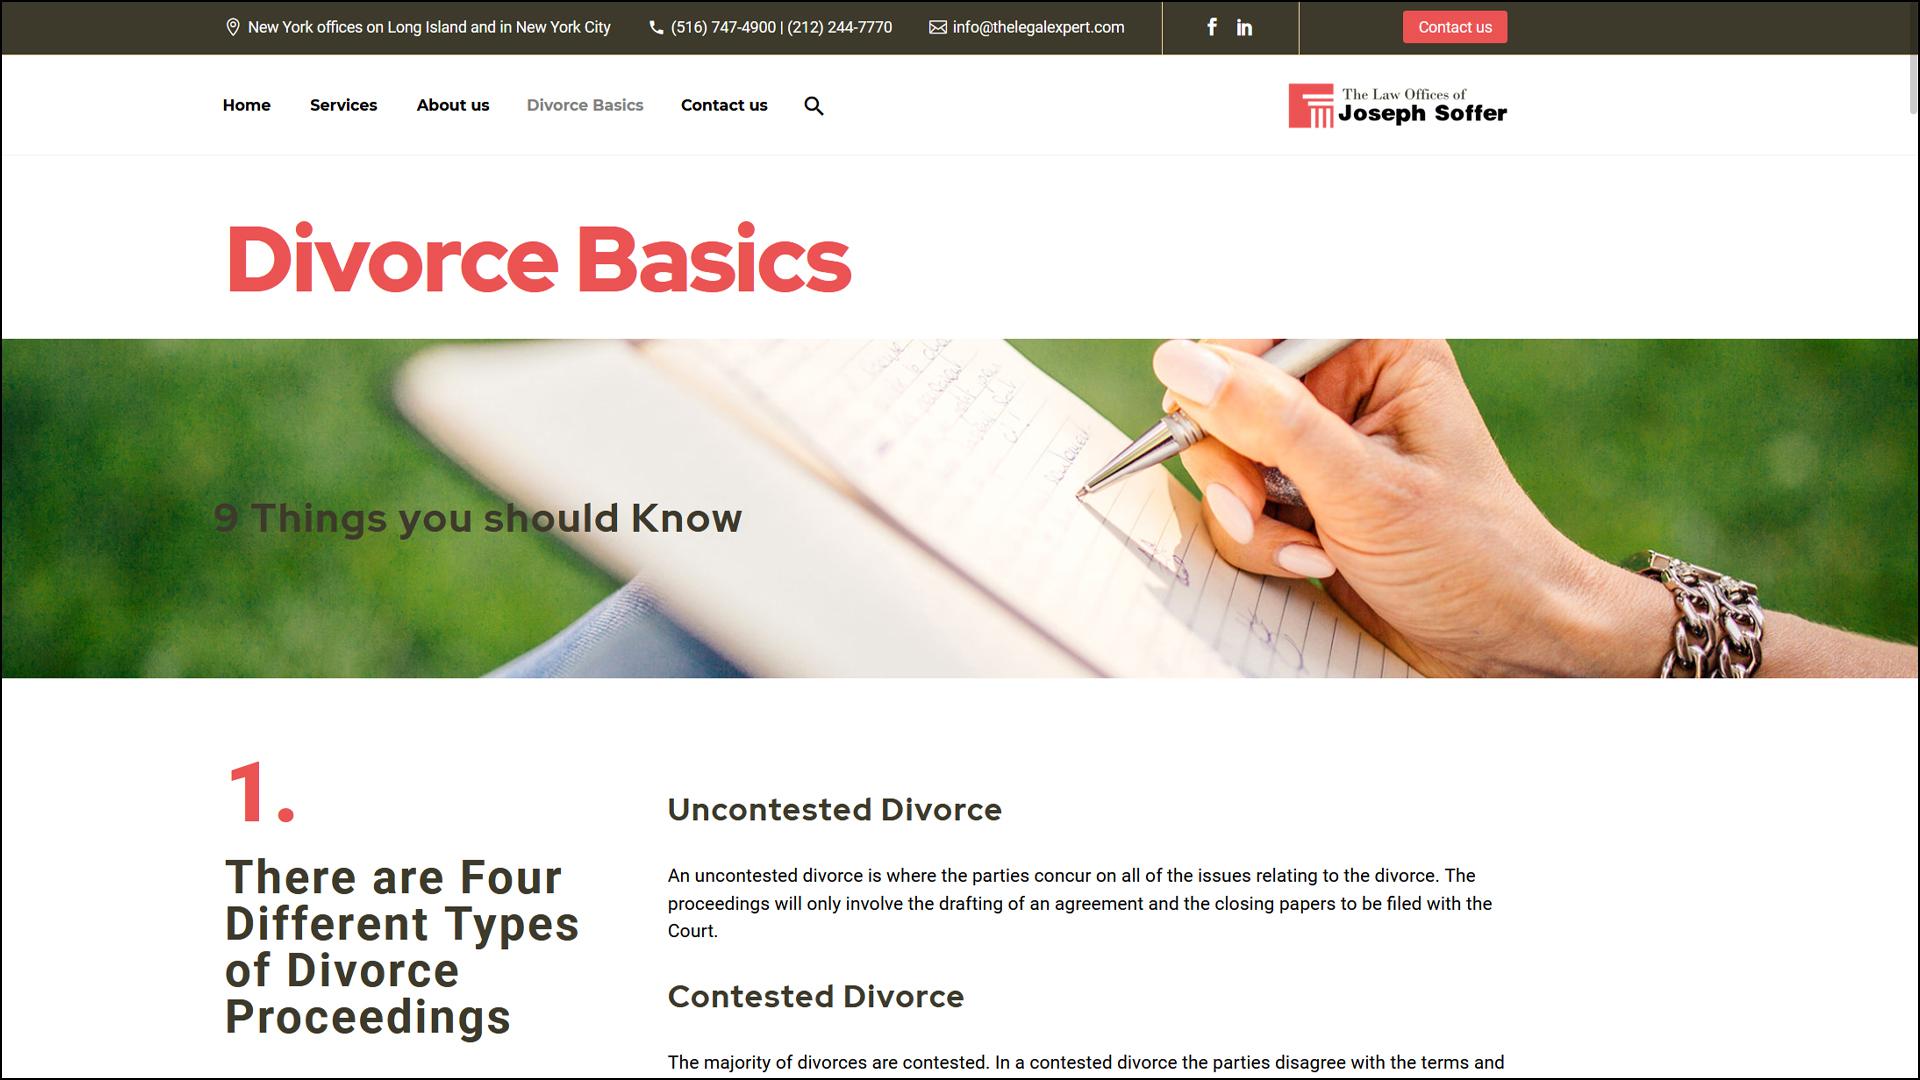 Stout Marketing designs legal page